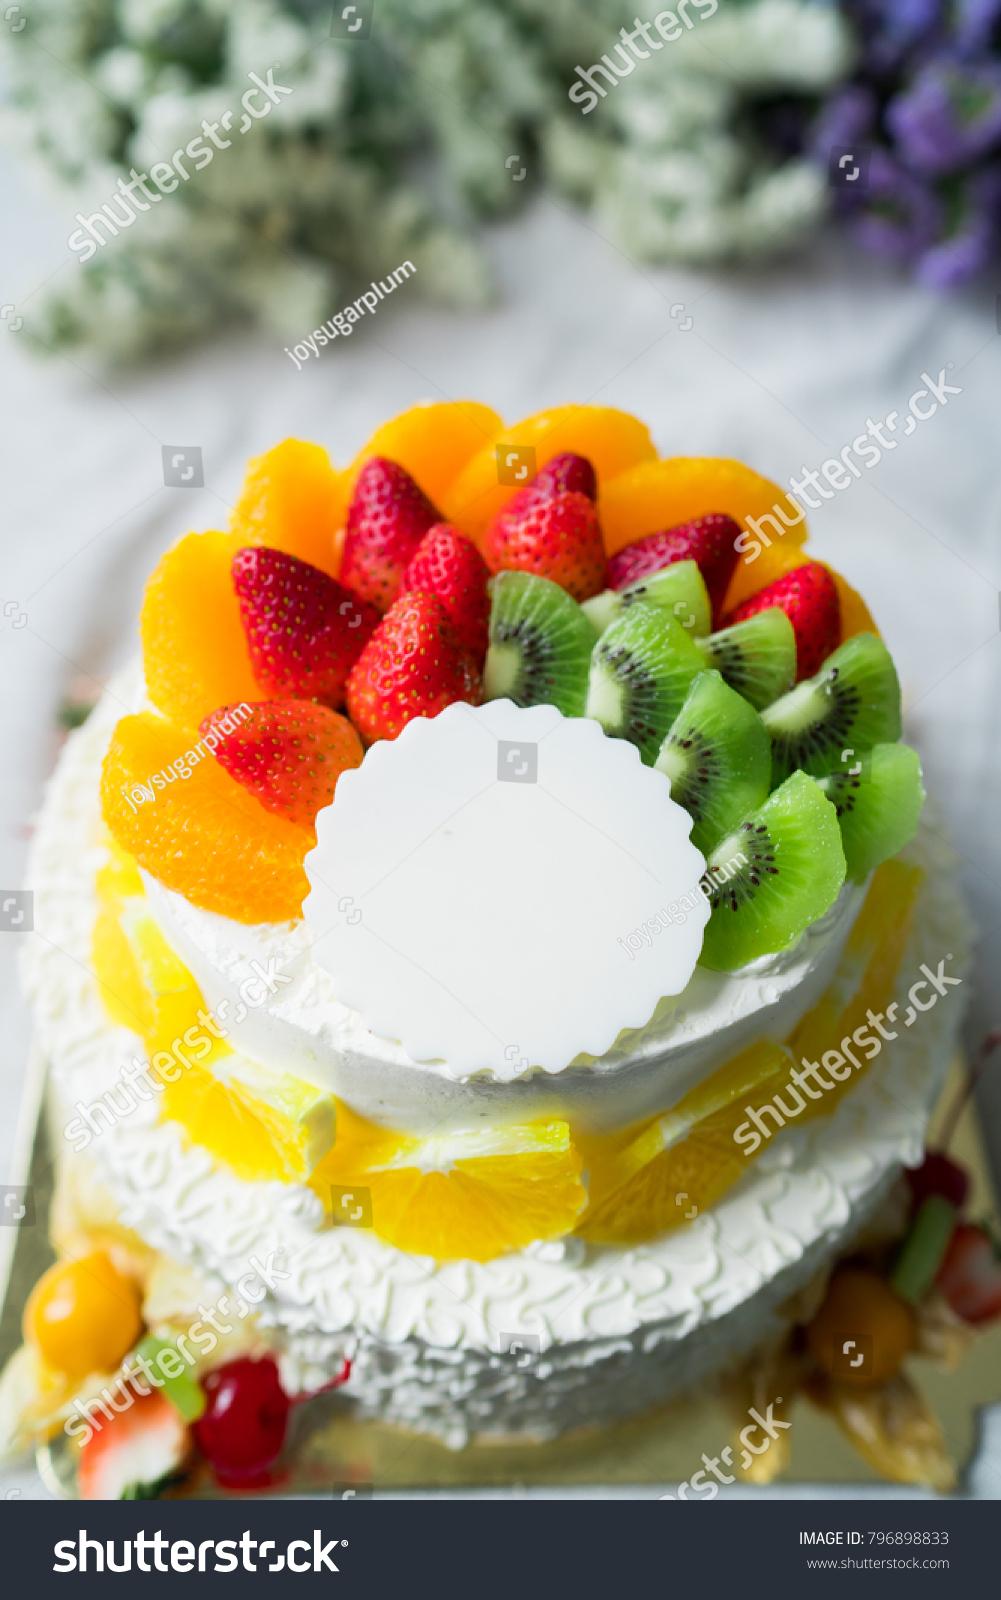 Wedding Cake Fruits Stock Photo Edit Now 796898833 Shutterstock